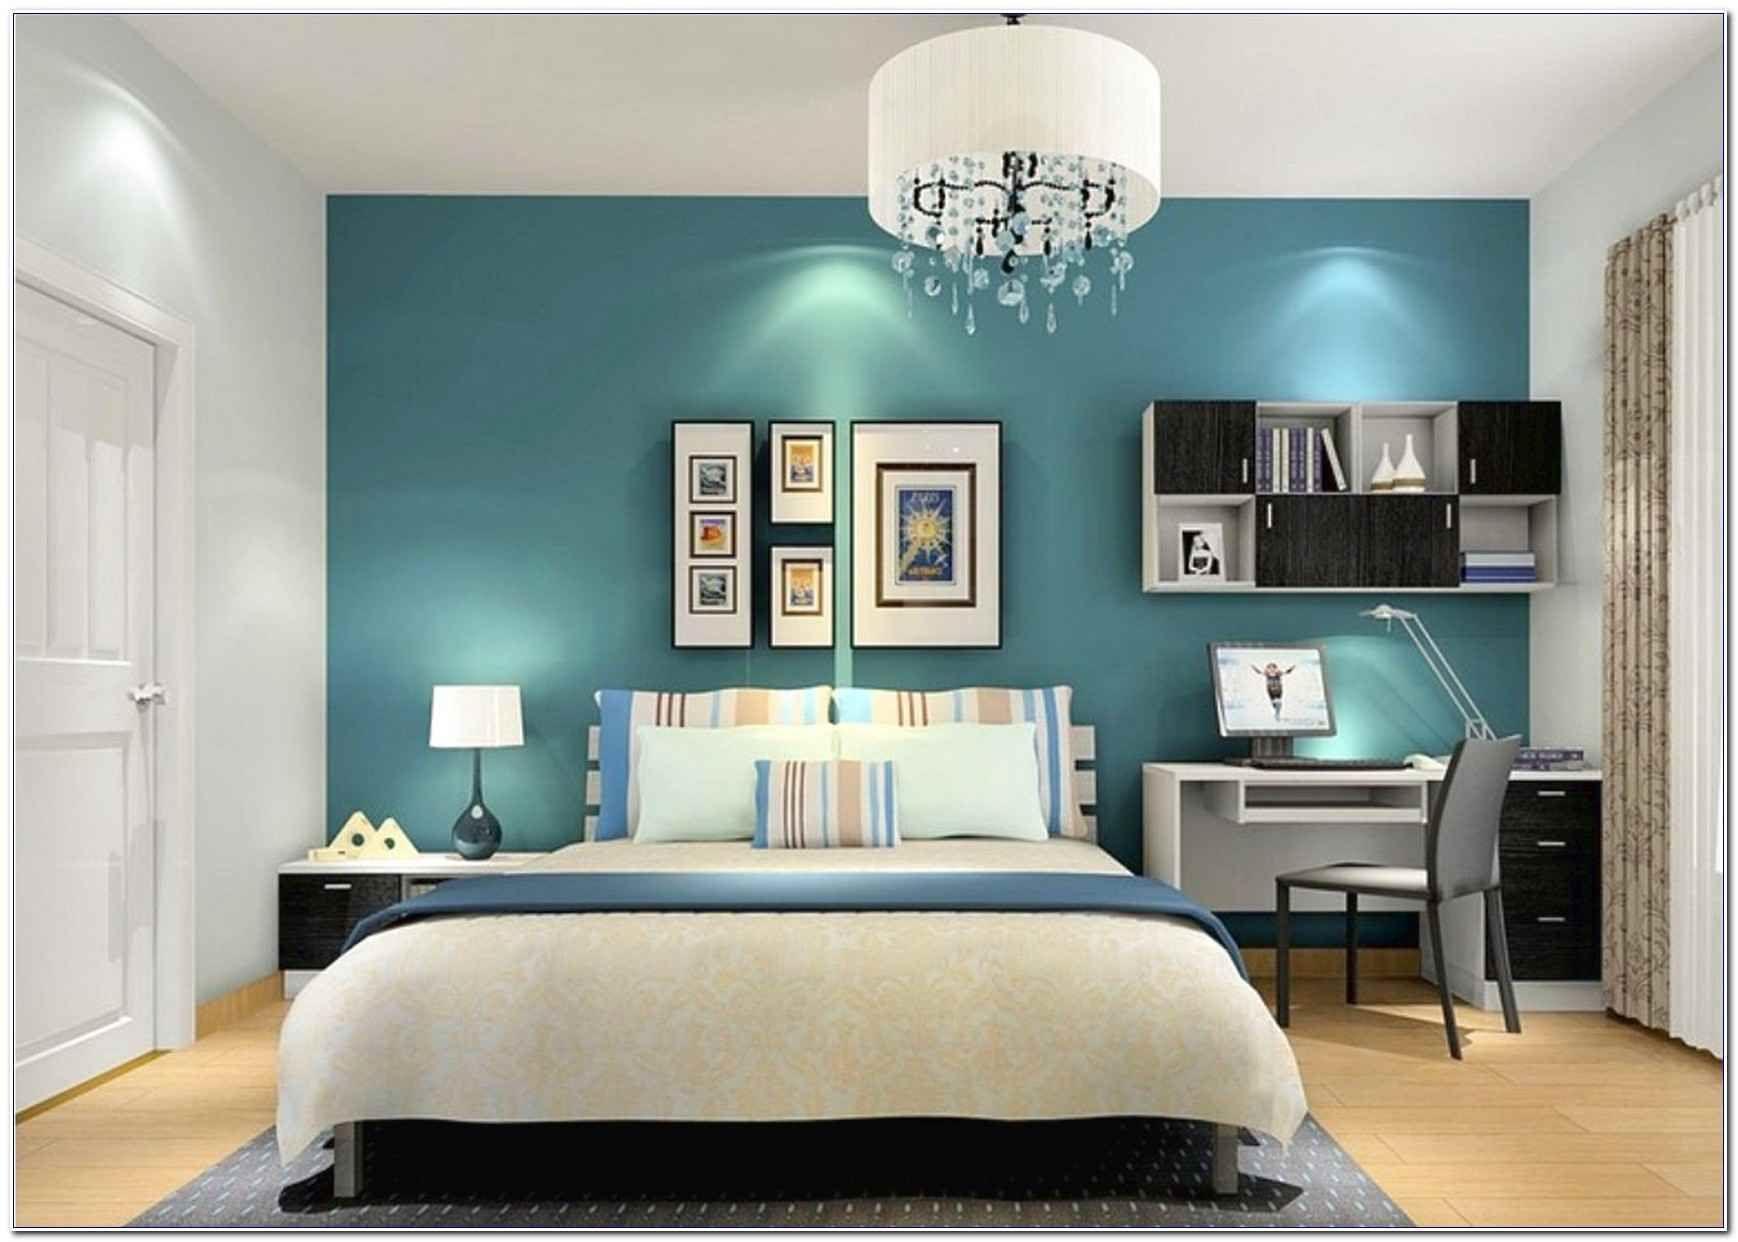 30 Teal Bedroom Ideas 2021 Super Fresh And Bold Decor Master White Design